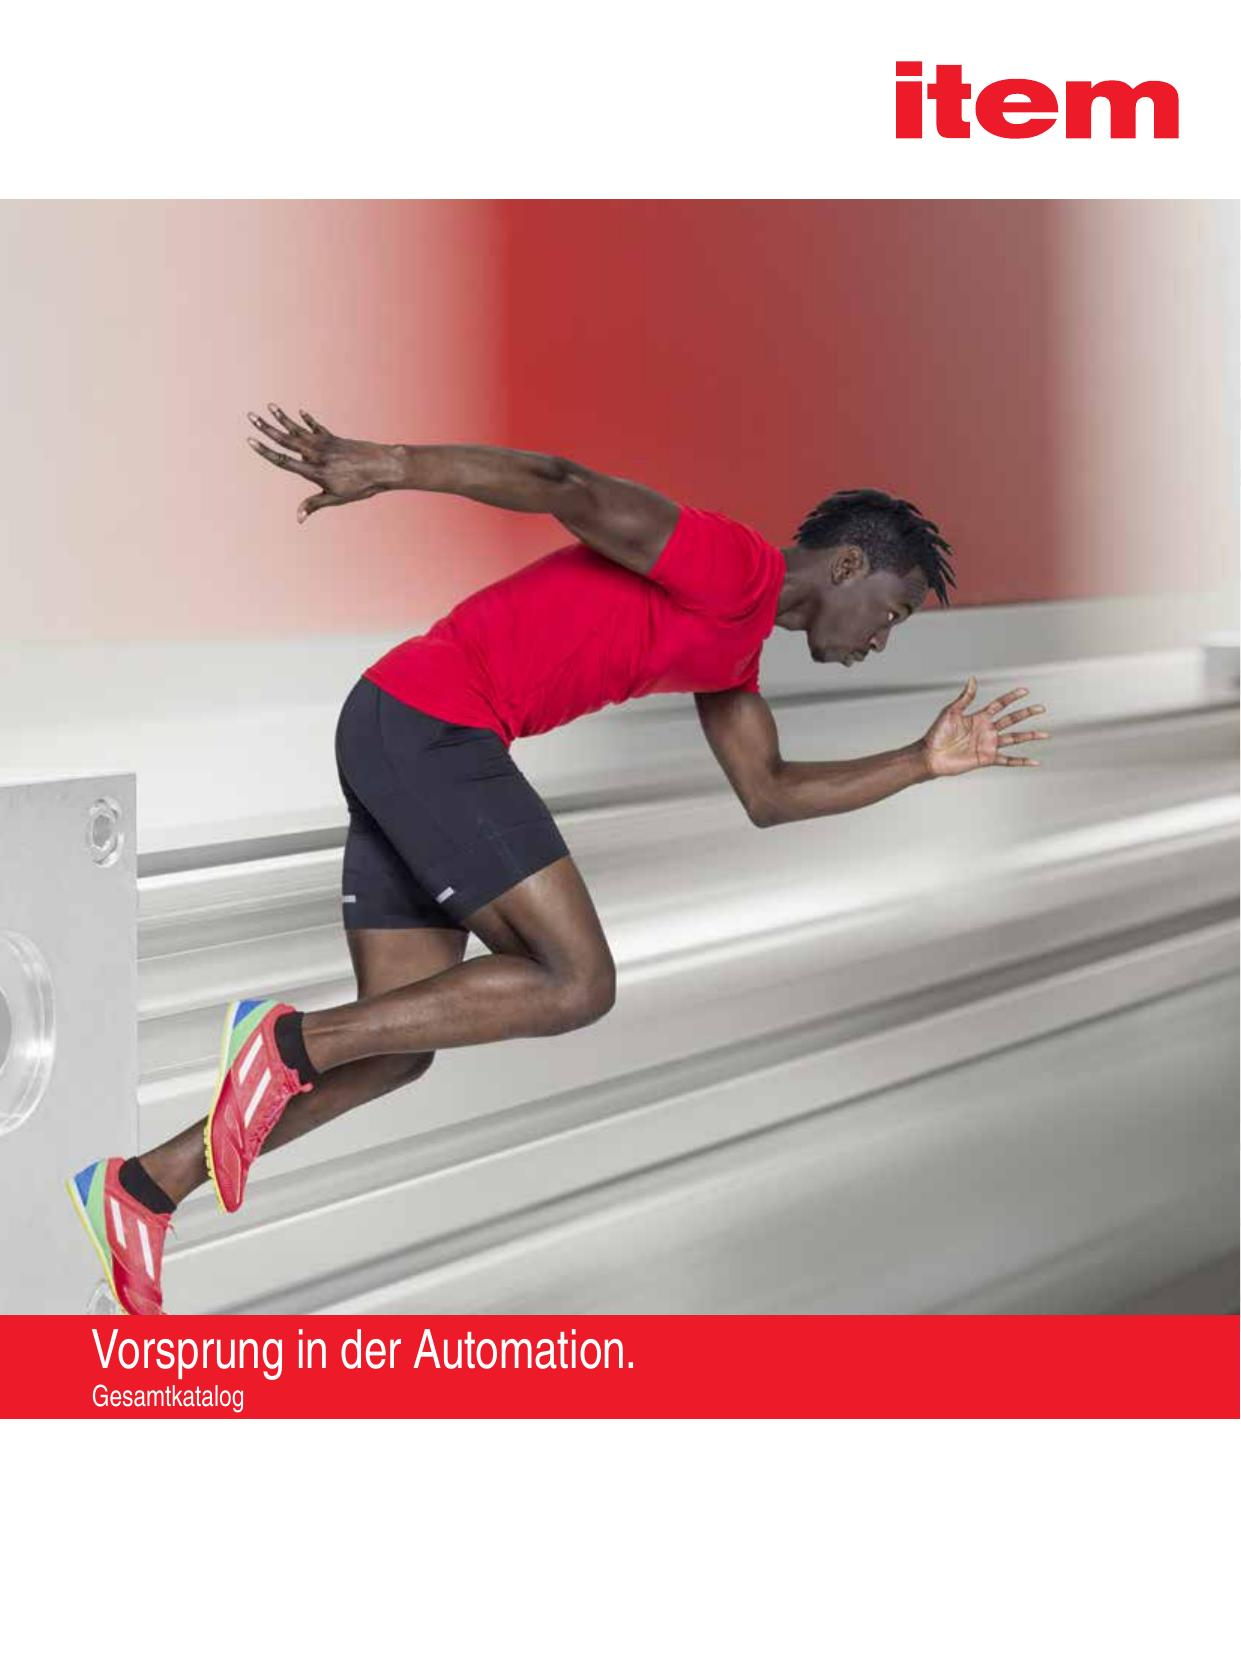 item Gesamtkatalog: Automation Deckblatt